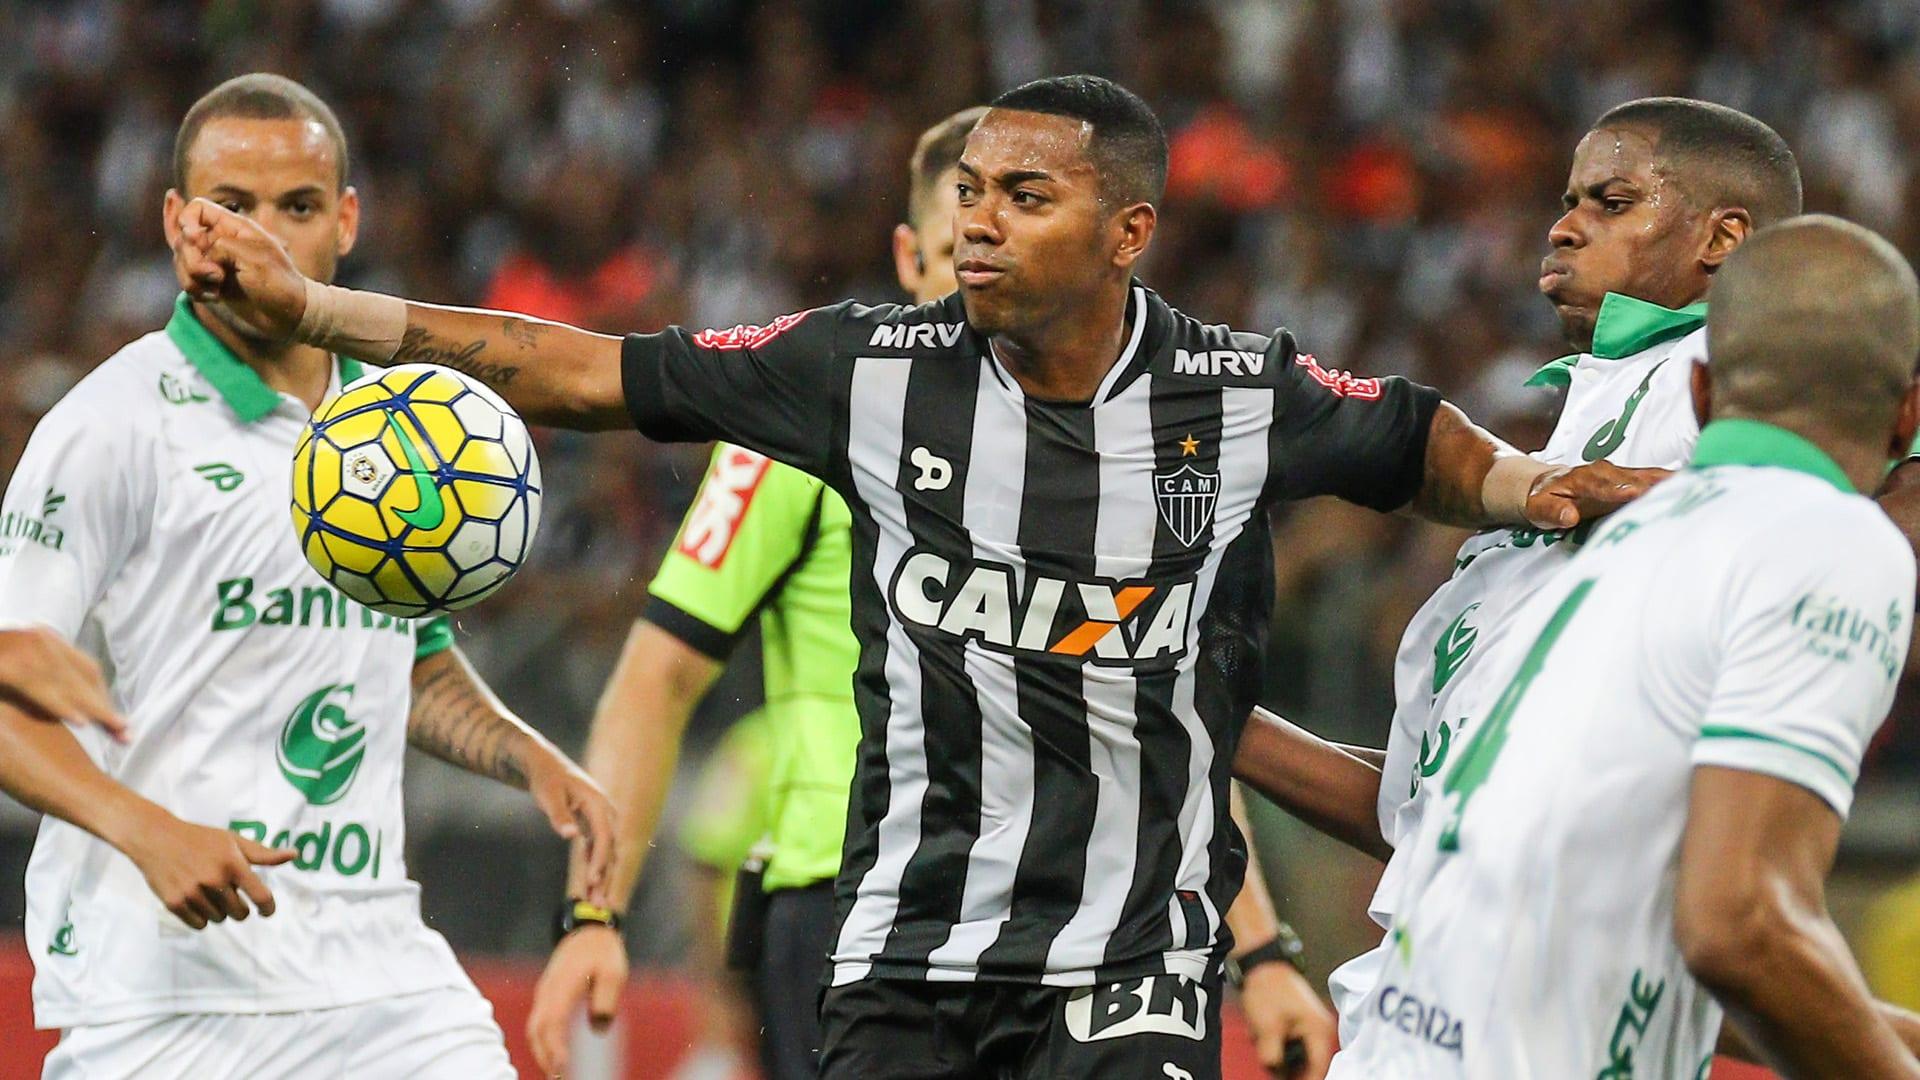 Vindos de resultados positivos, Juventude e Atlético-MG duelam, no Estádio Alfredo Jaconi, na tarde deste domingo (8), ás 16h